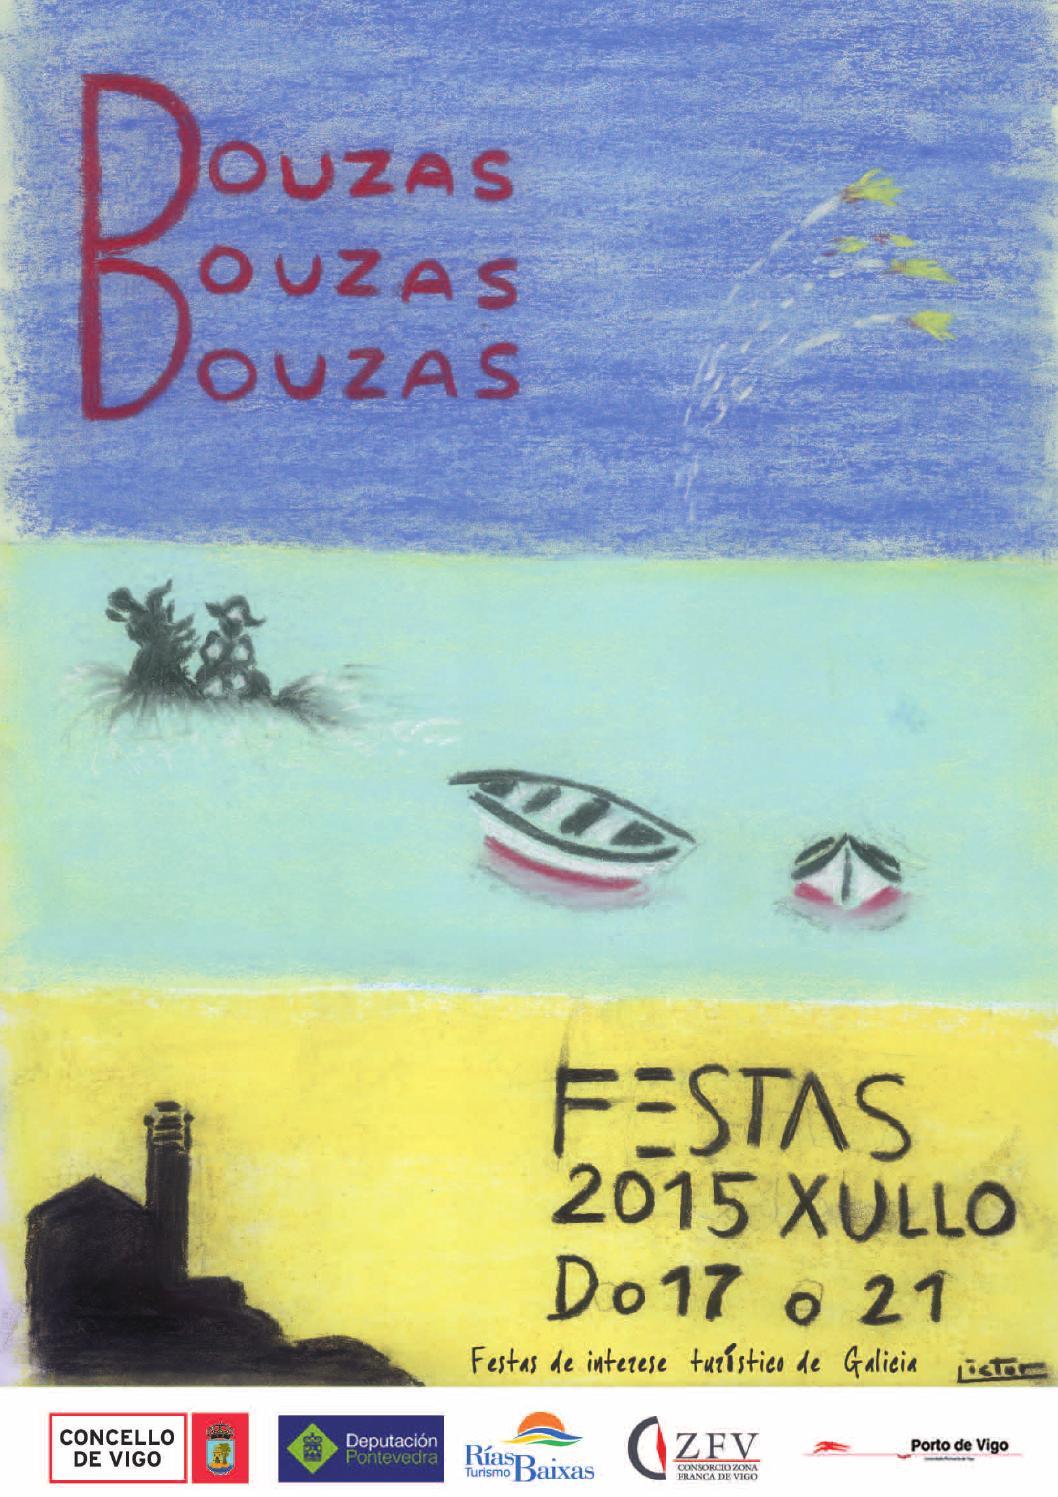 Bouzas 2015 baja resolucion by Vila de Bouzas Festas de Bouzas - issuu